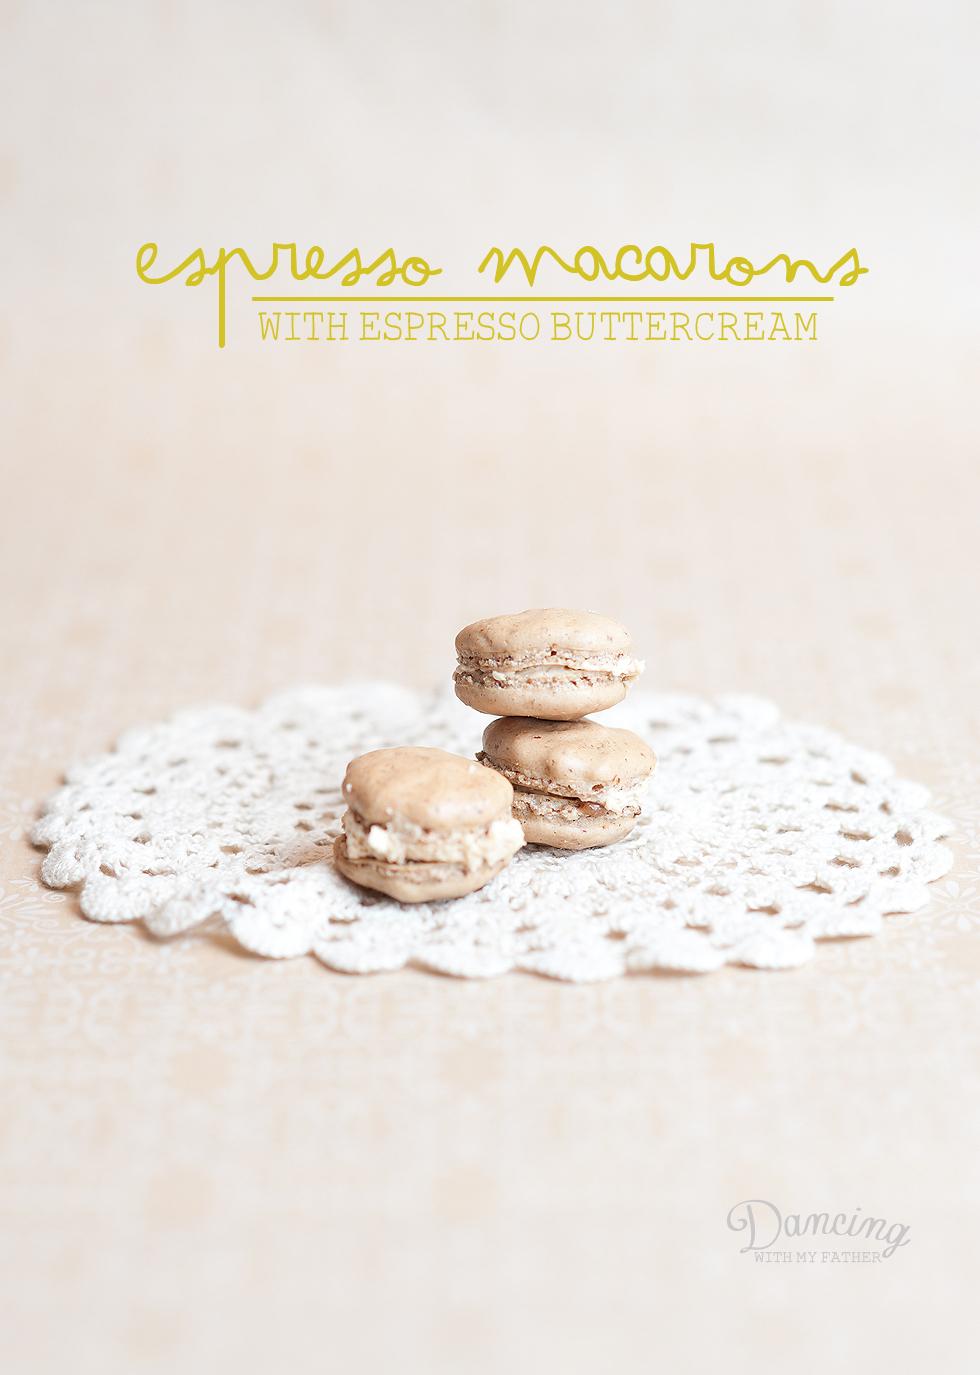 espresso parisian macaron with espresso buttercream